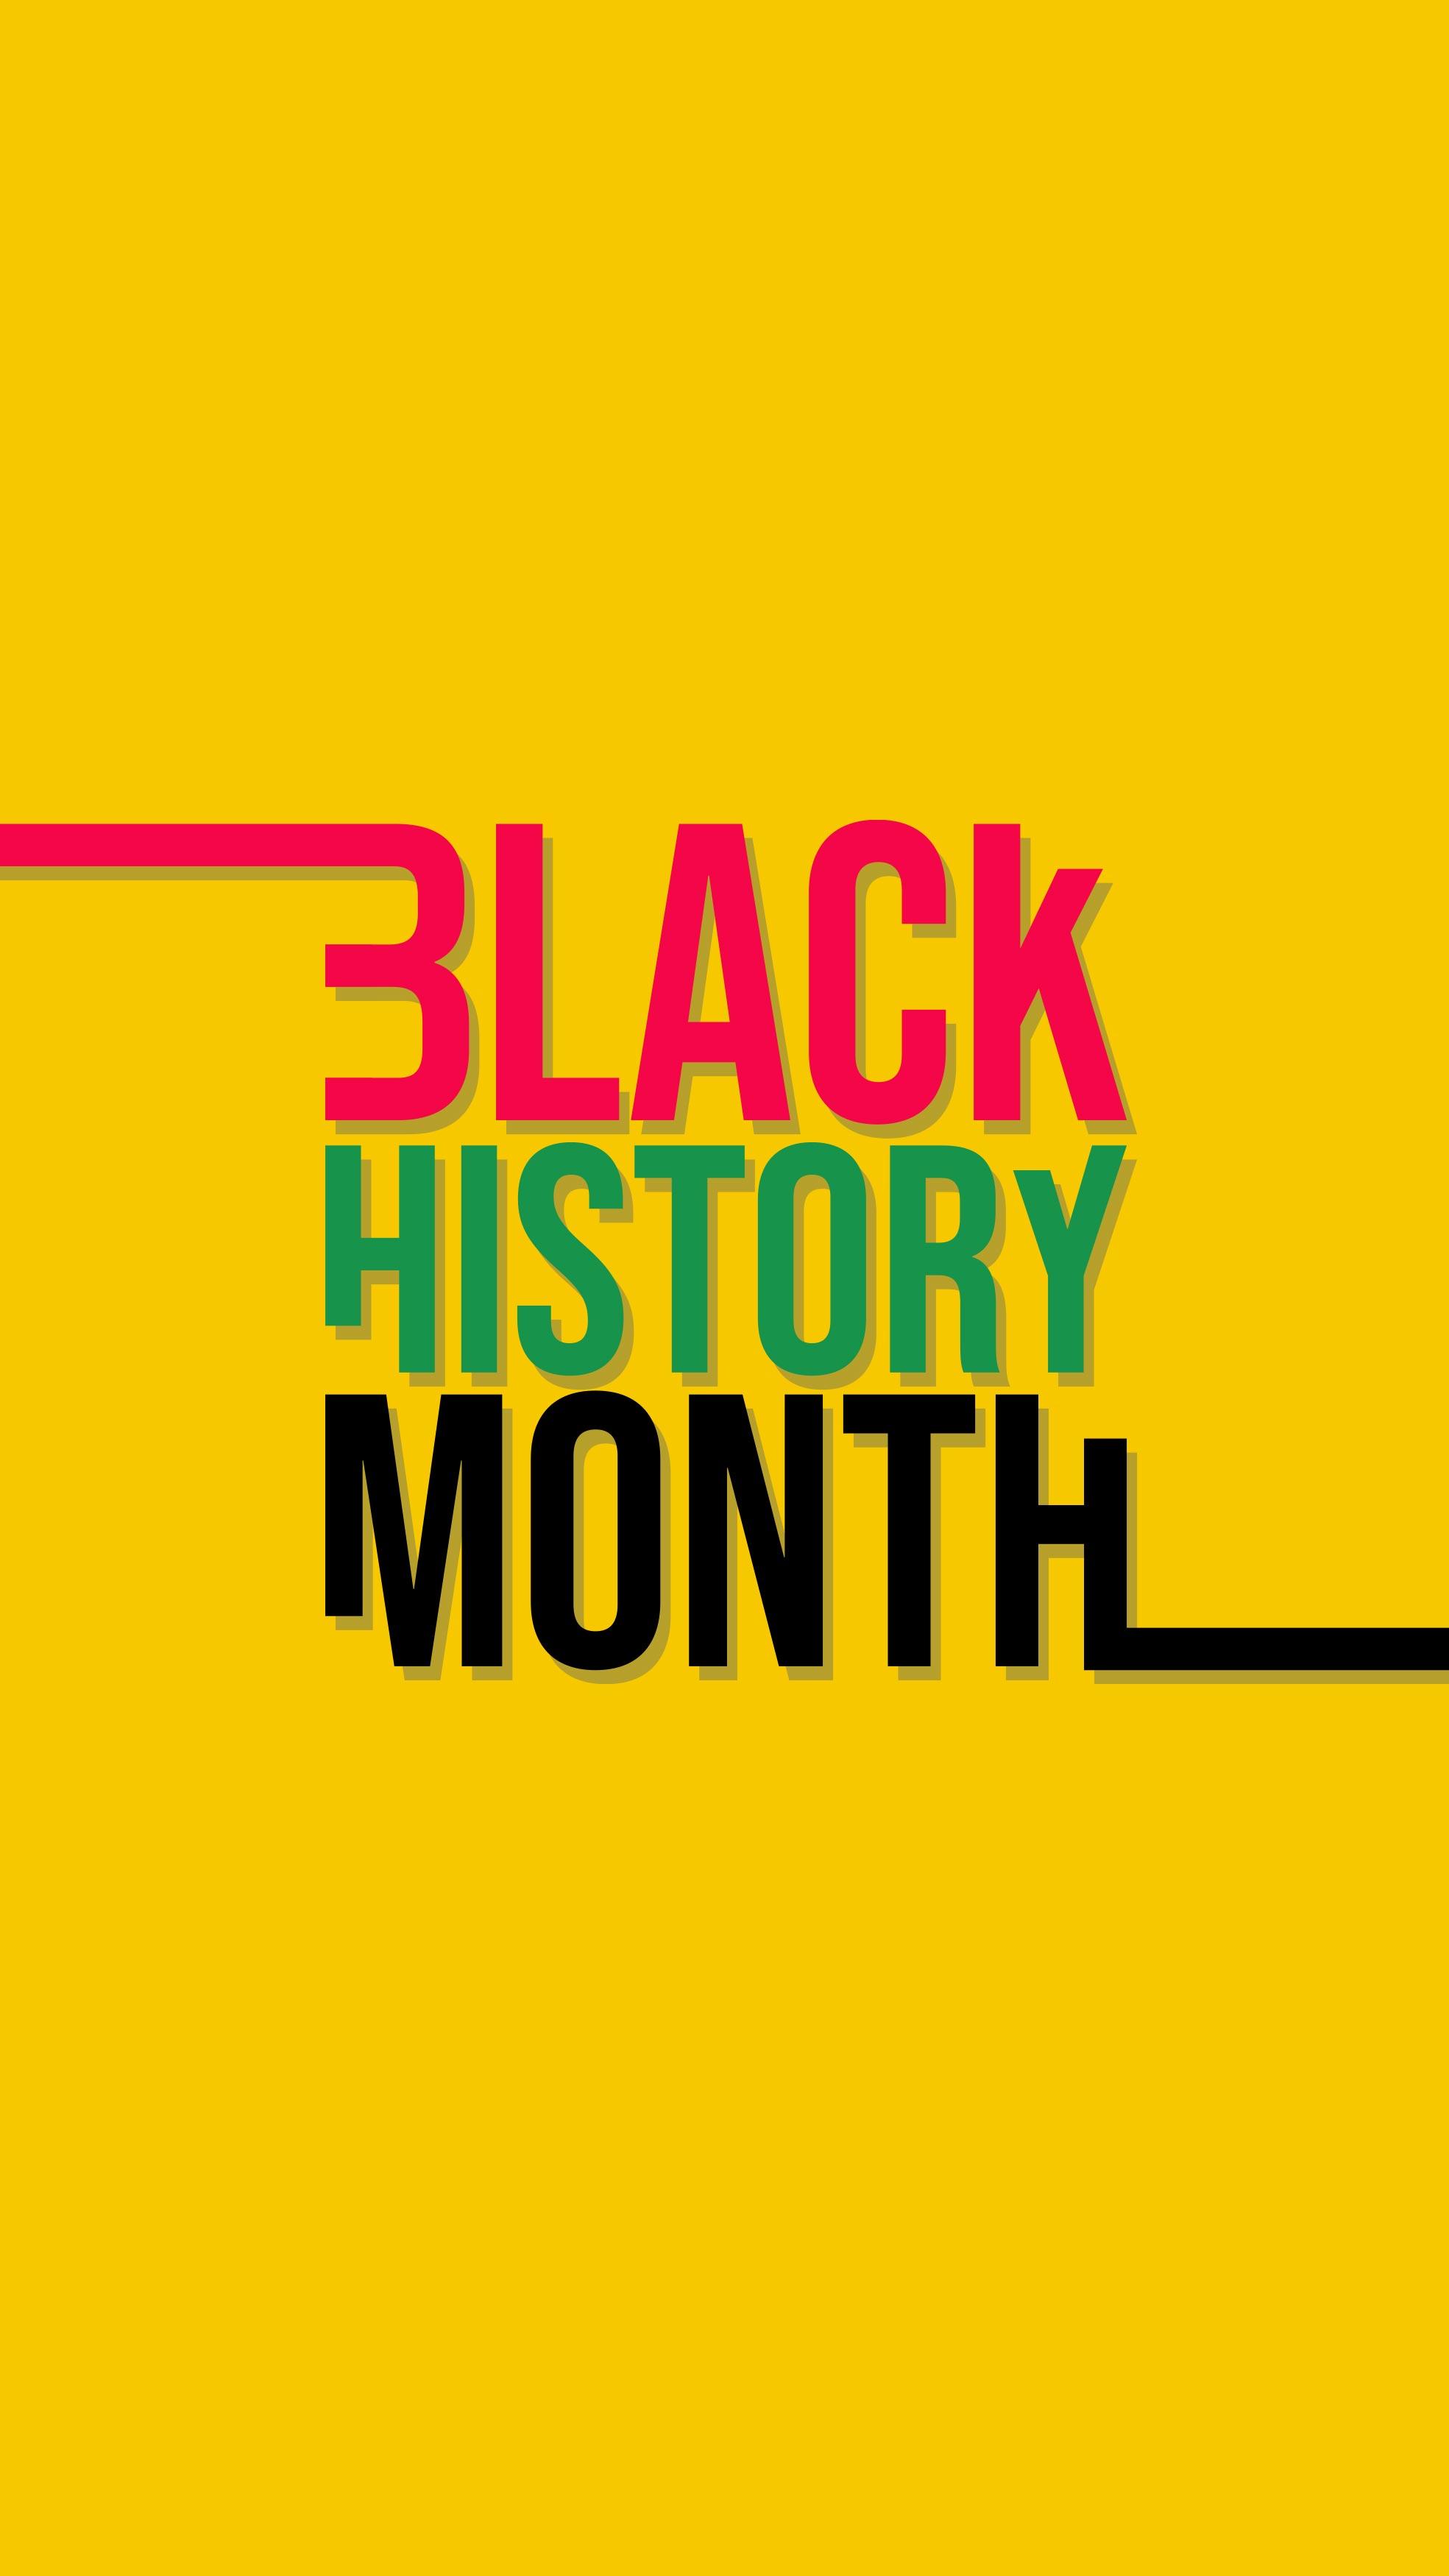 Black History Month 4